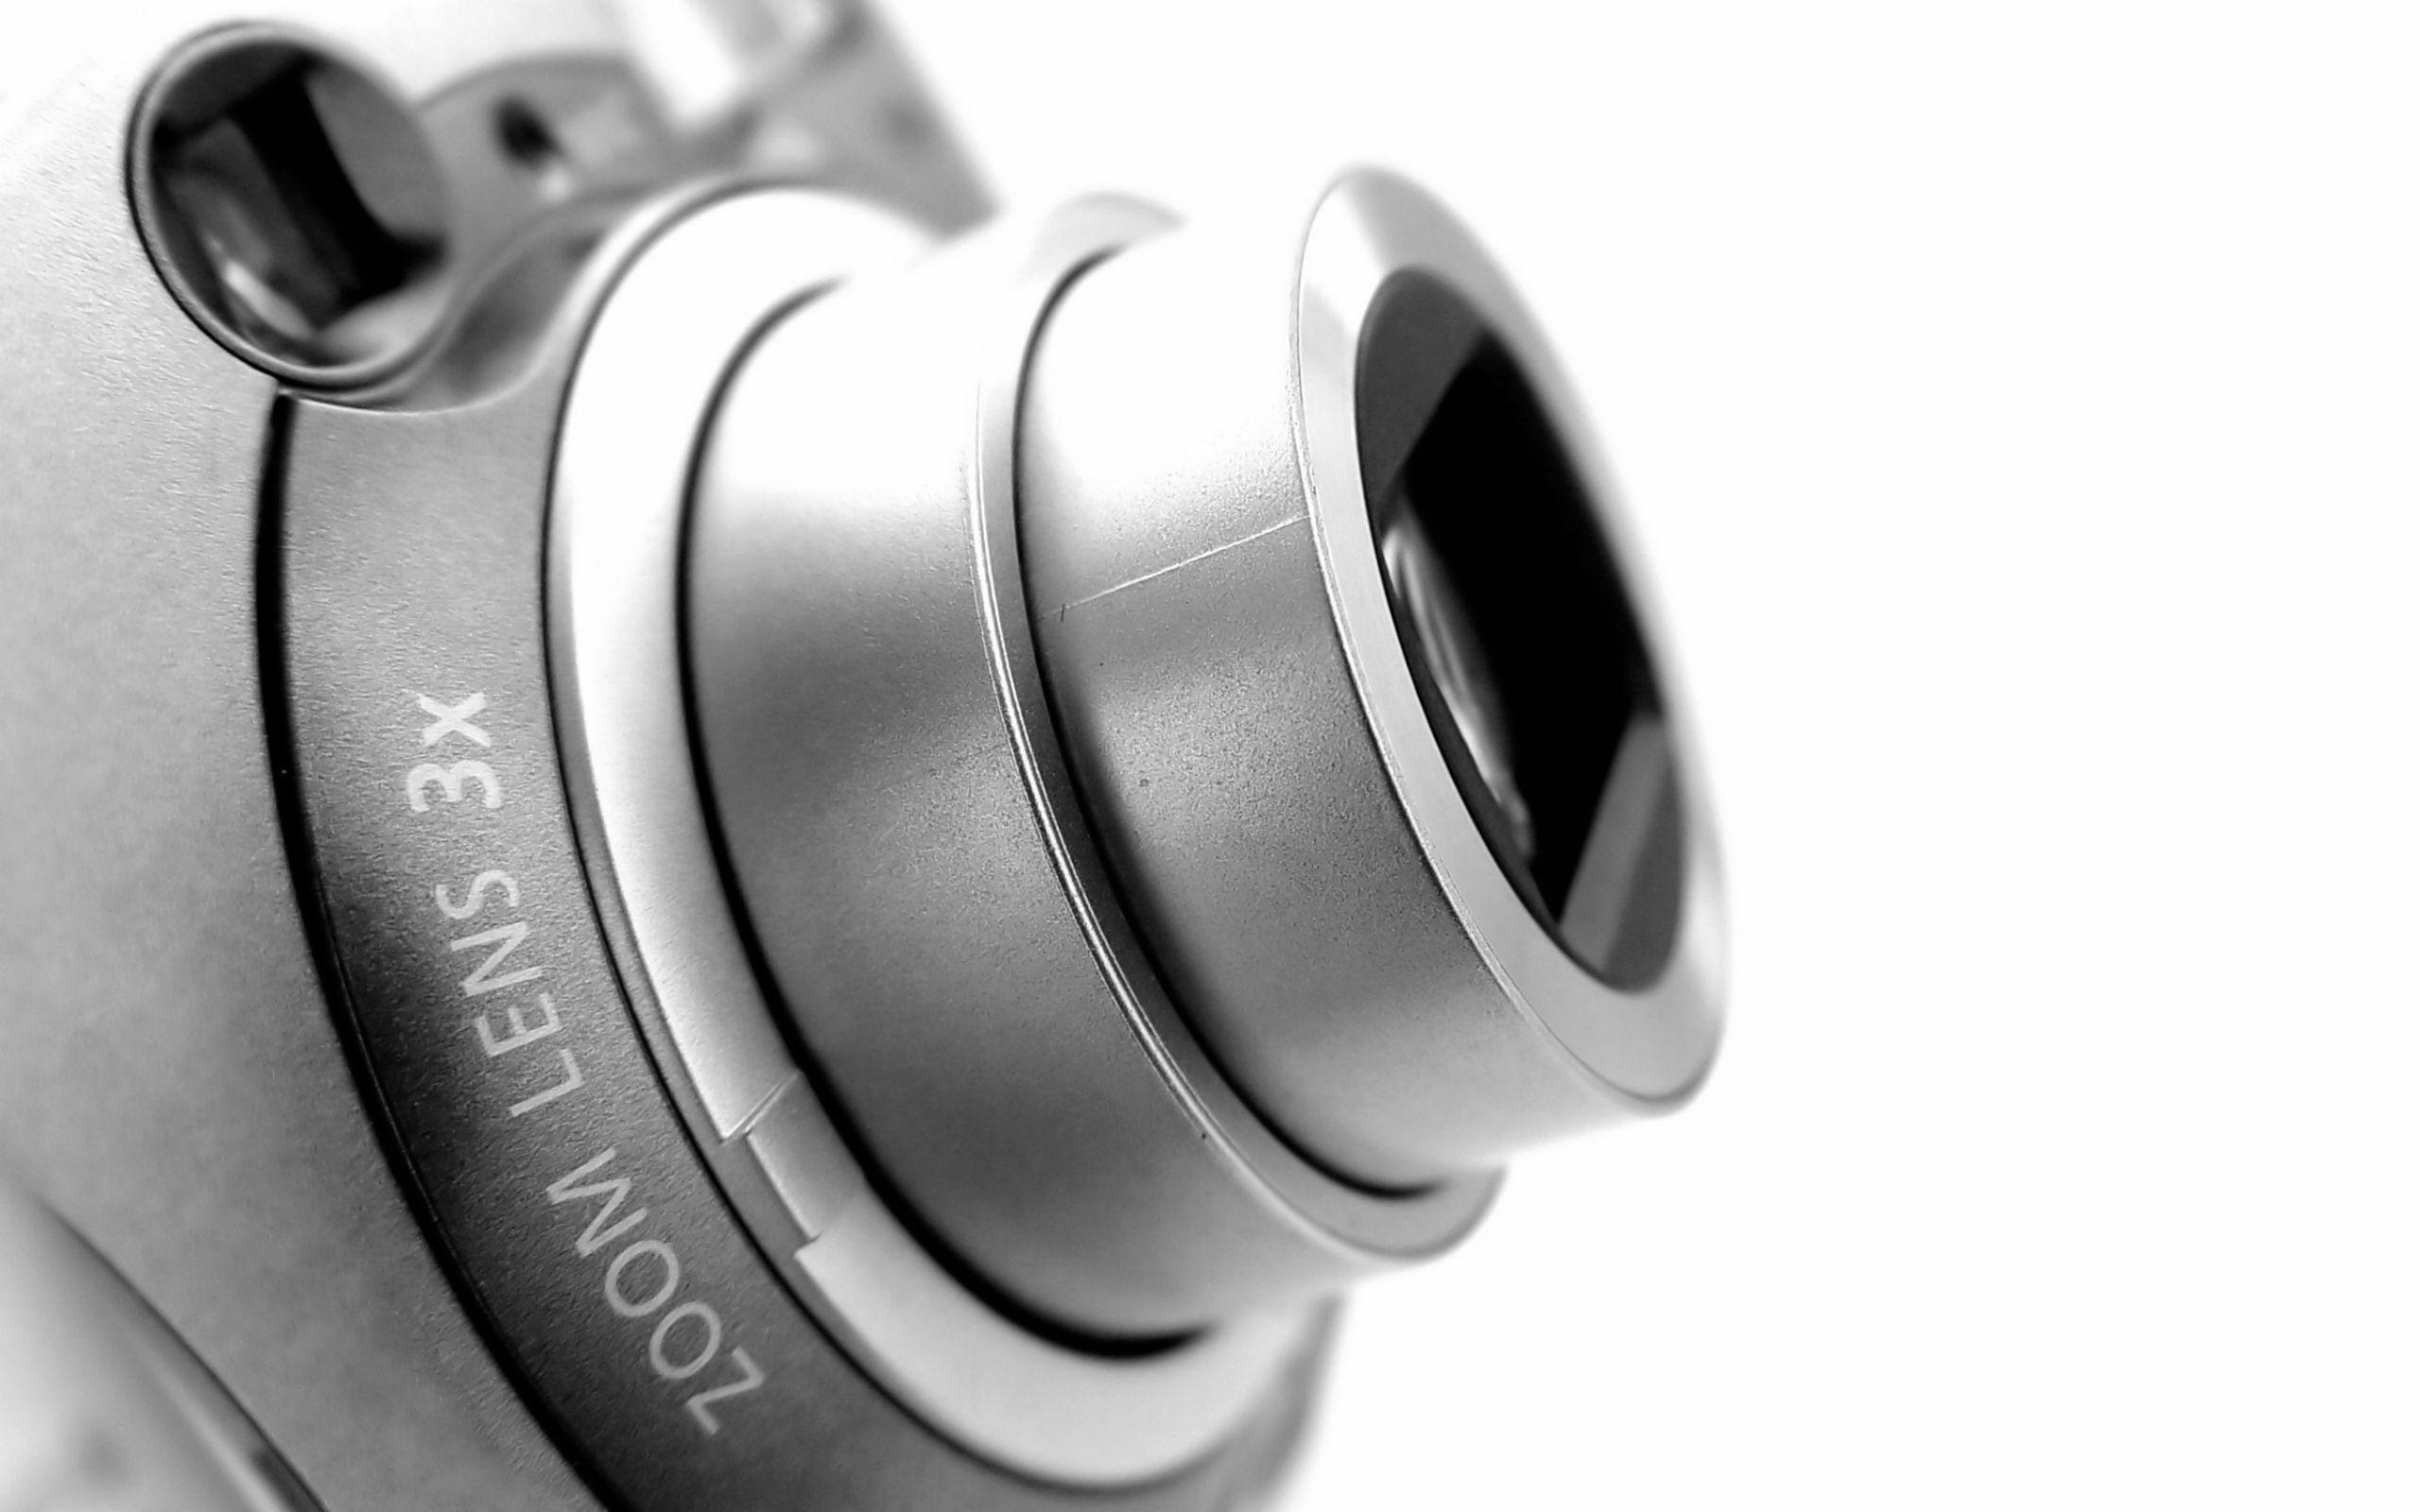 digital-camera-lens-closeup